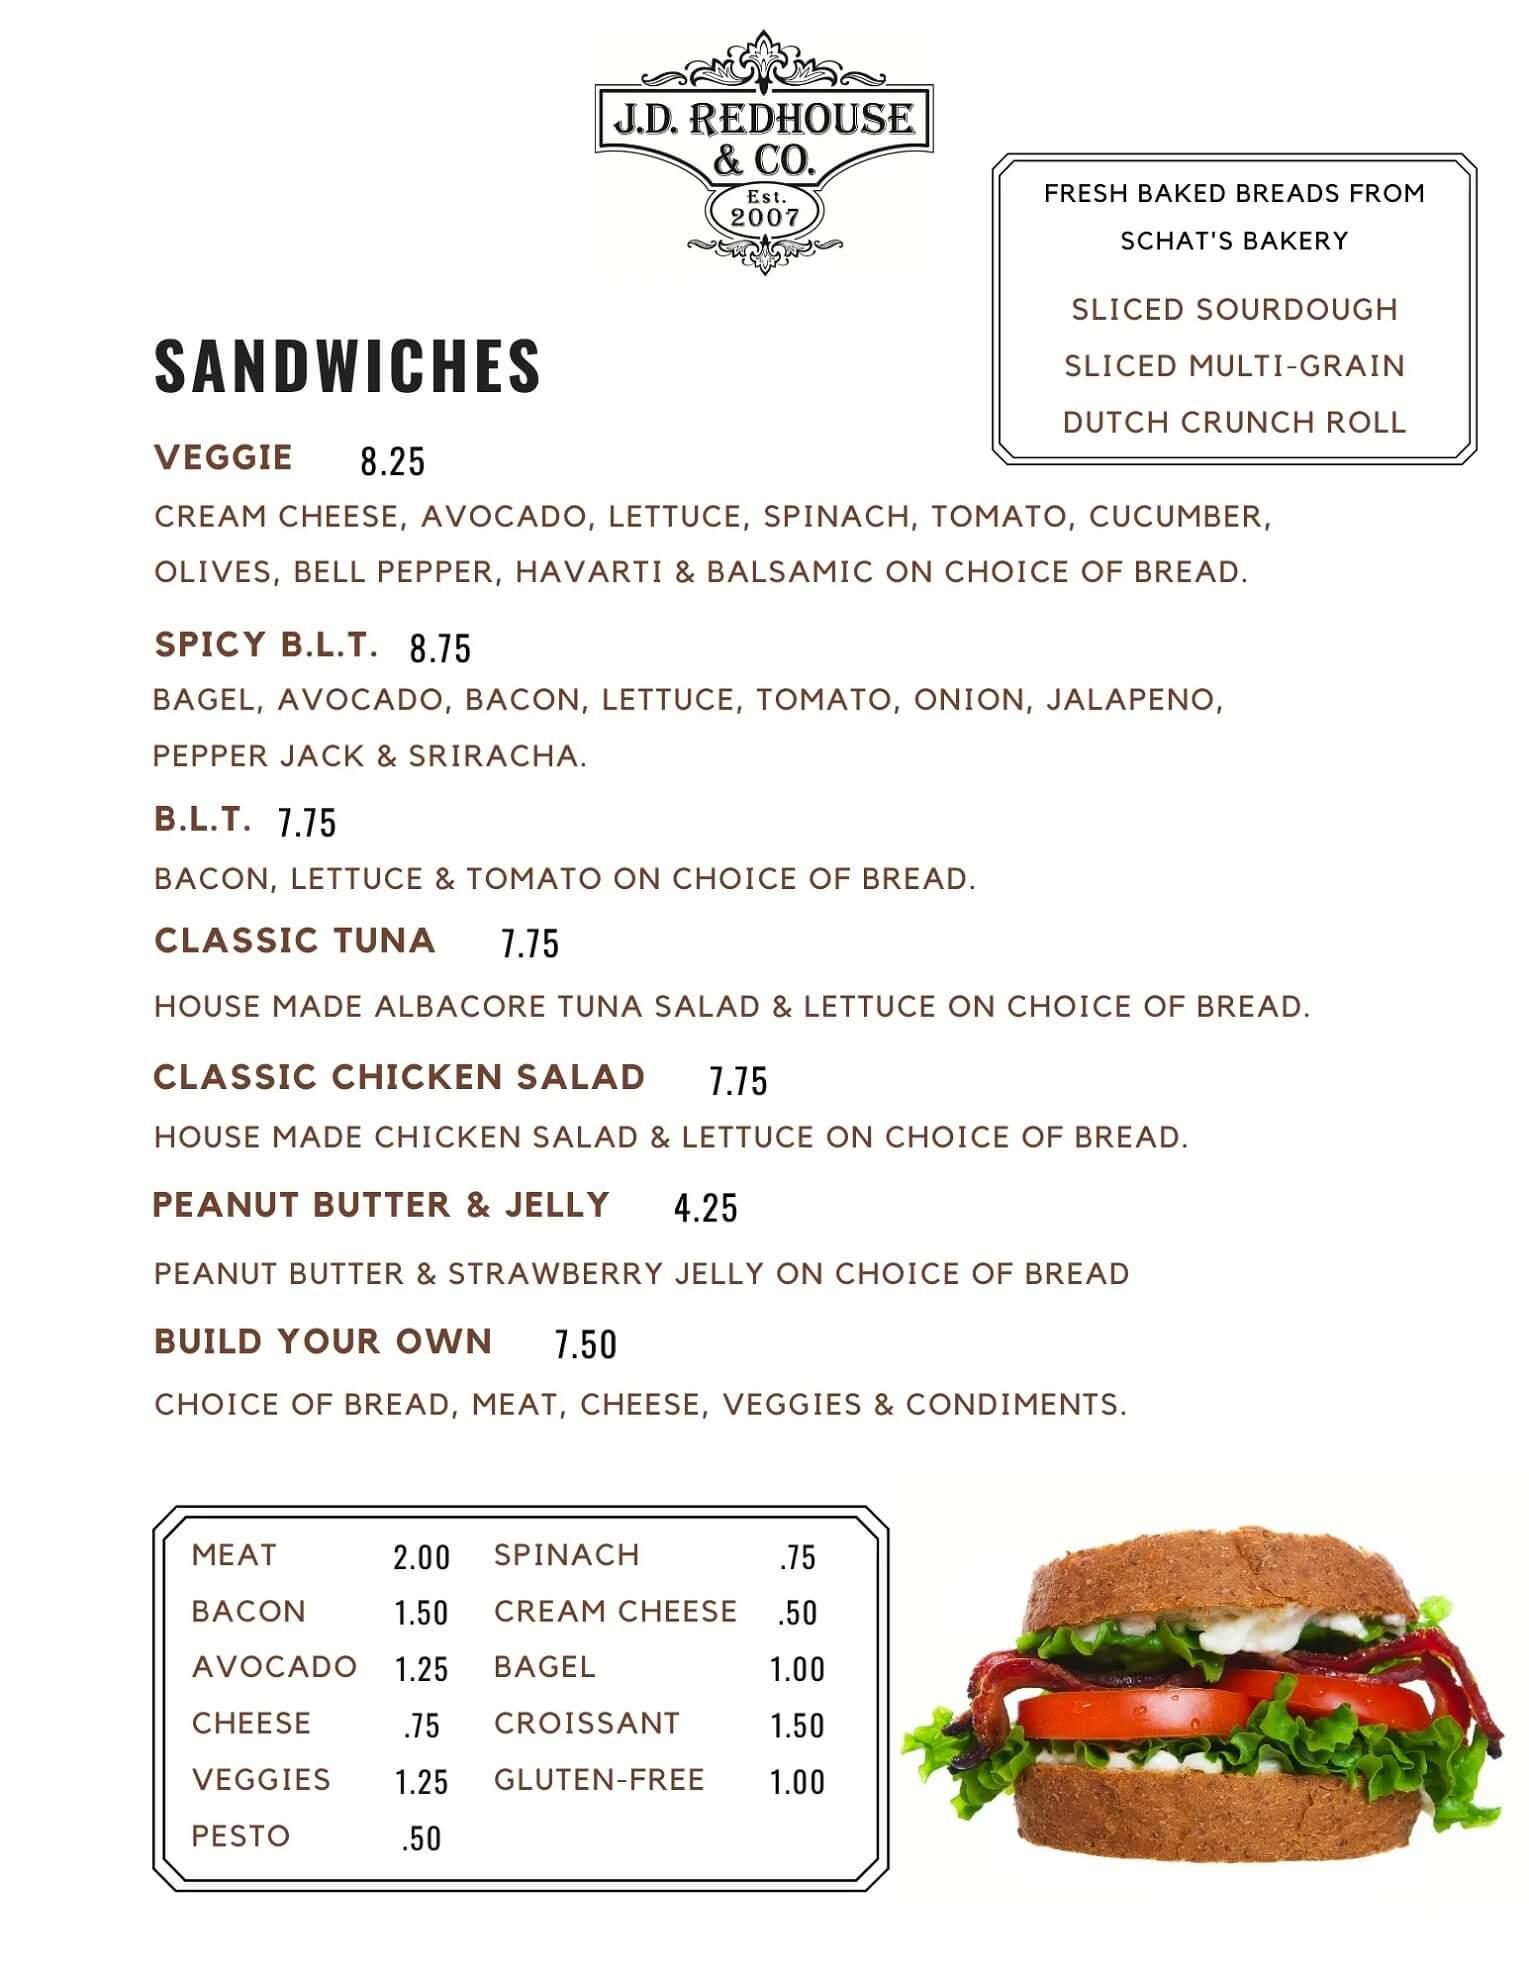 JD Redhouse Sandwiches Menu - Willits California